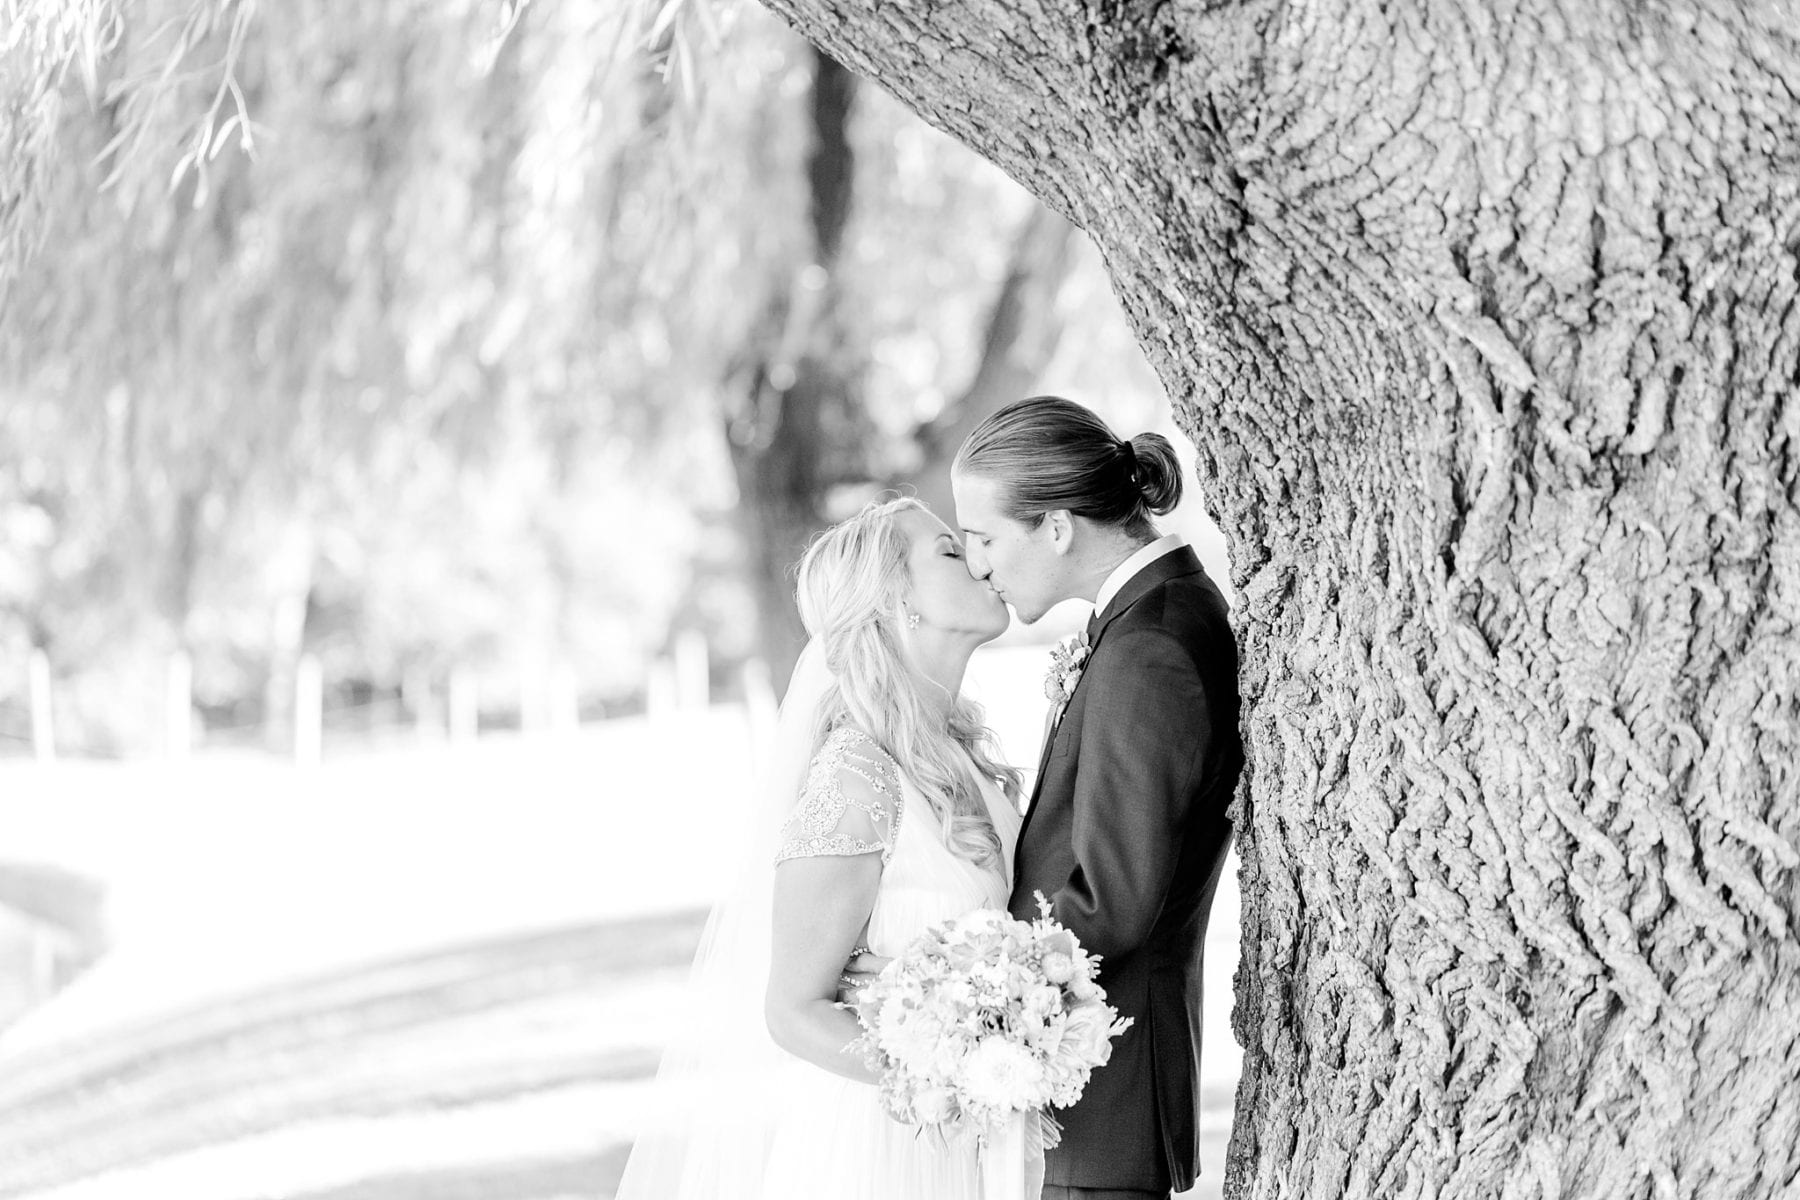 Pond View Farm Wedding Photos Maryland Wedding Photographer Kristen & Ryan Megan Kelsey Photography Blog-177.jpg